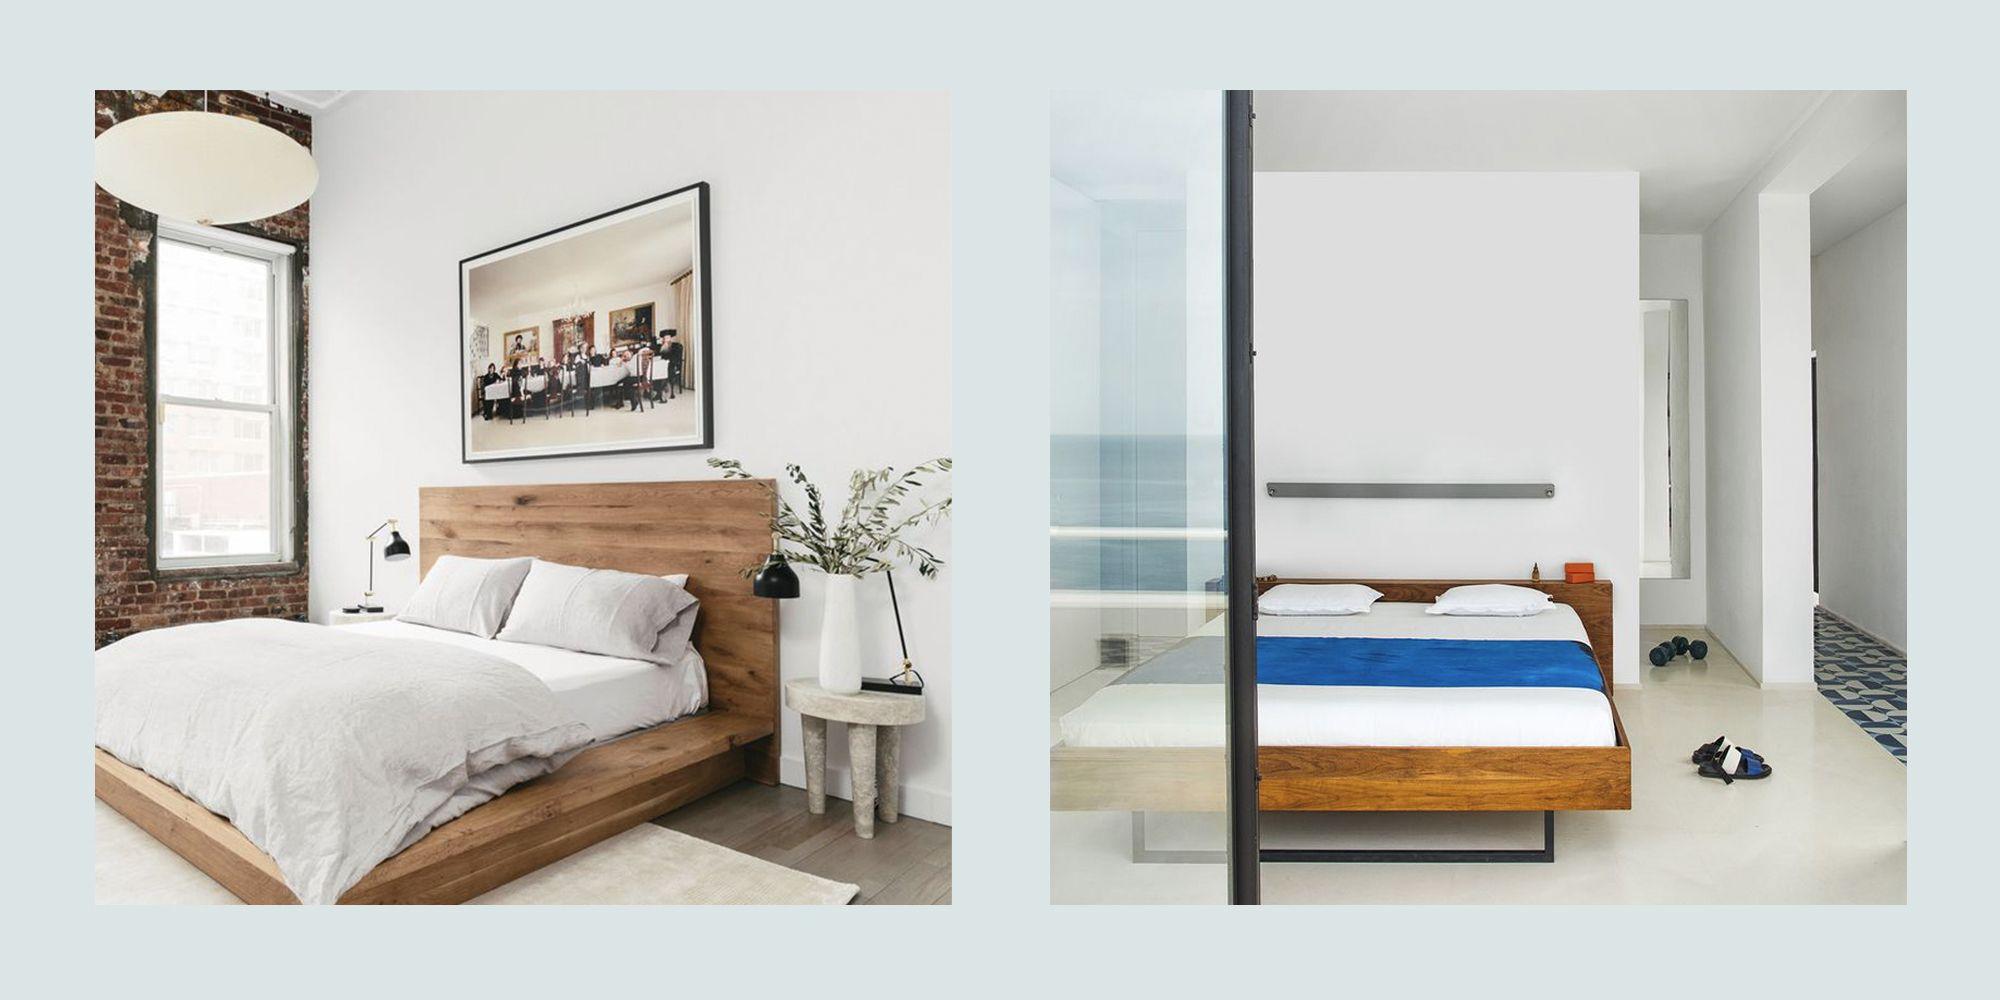 30+ Minimalist Bedroom Decor Ideas - Modern Designs for ... on Bedroom Minimalist Design Ideas  id=54802